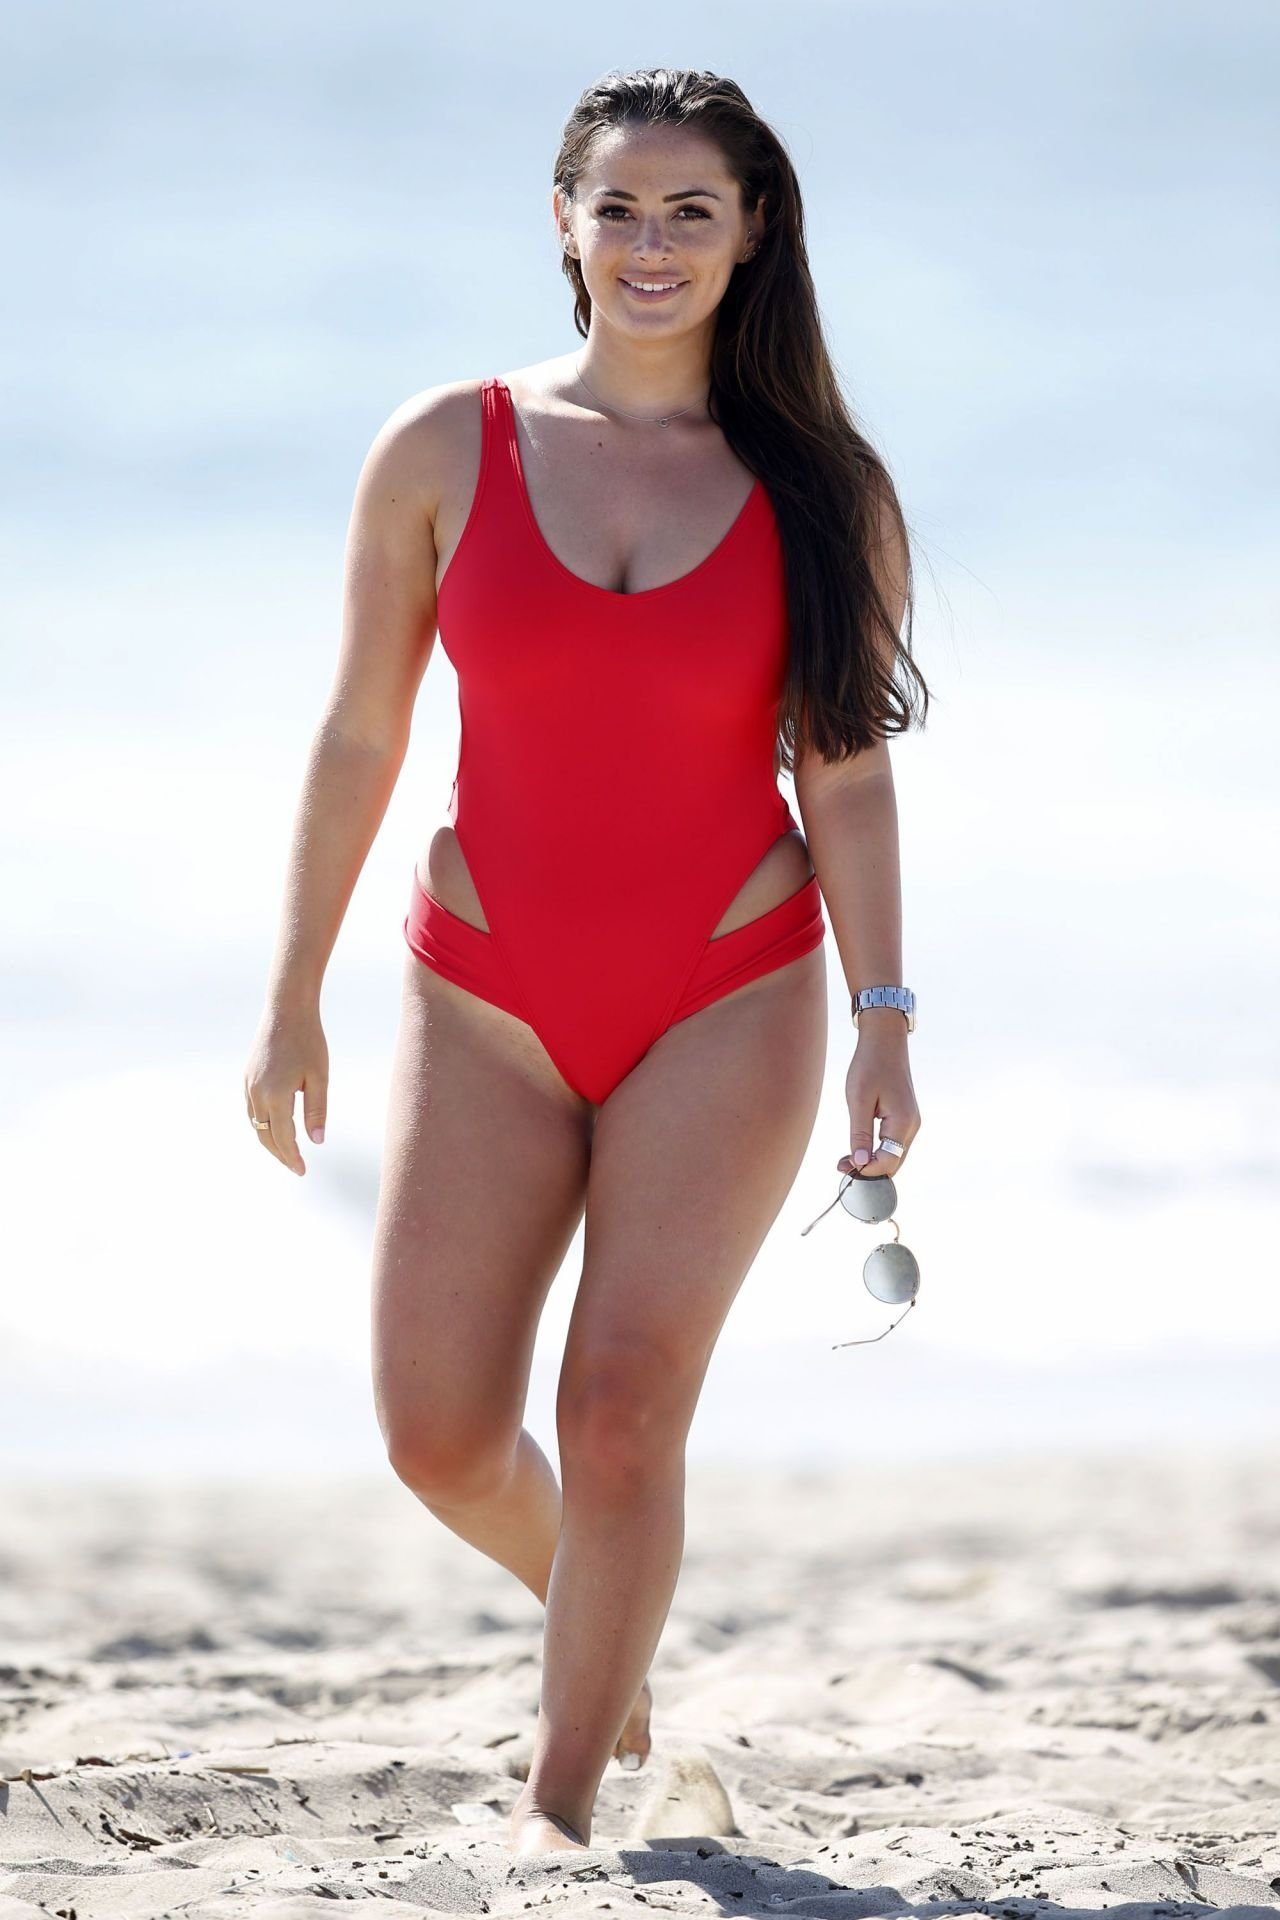 Penelope cruz nude scene in volaverunt movie Erotic tube Olga kobzar nude 7 Photos,Michelle Trachtenberg Flashing Her Boobs Vid